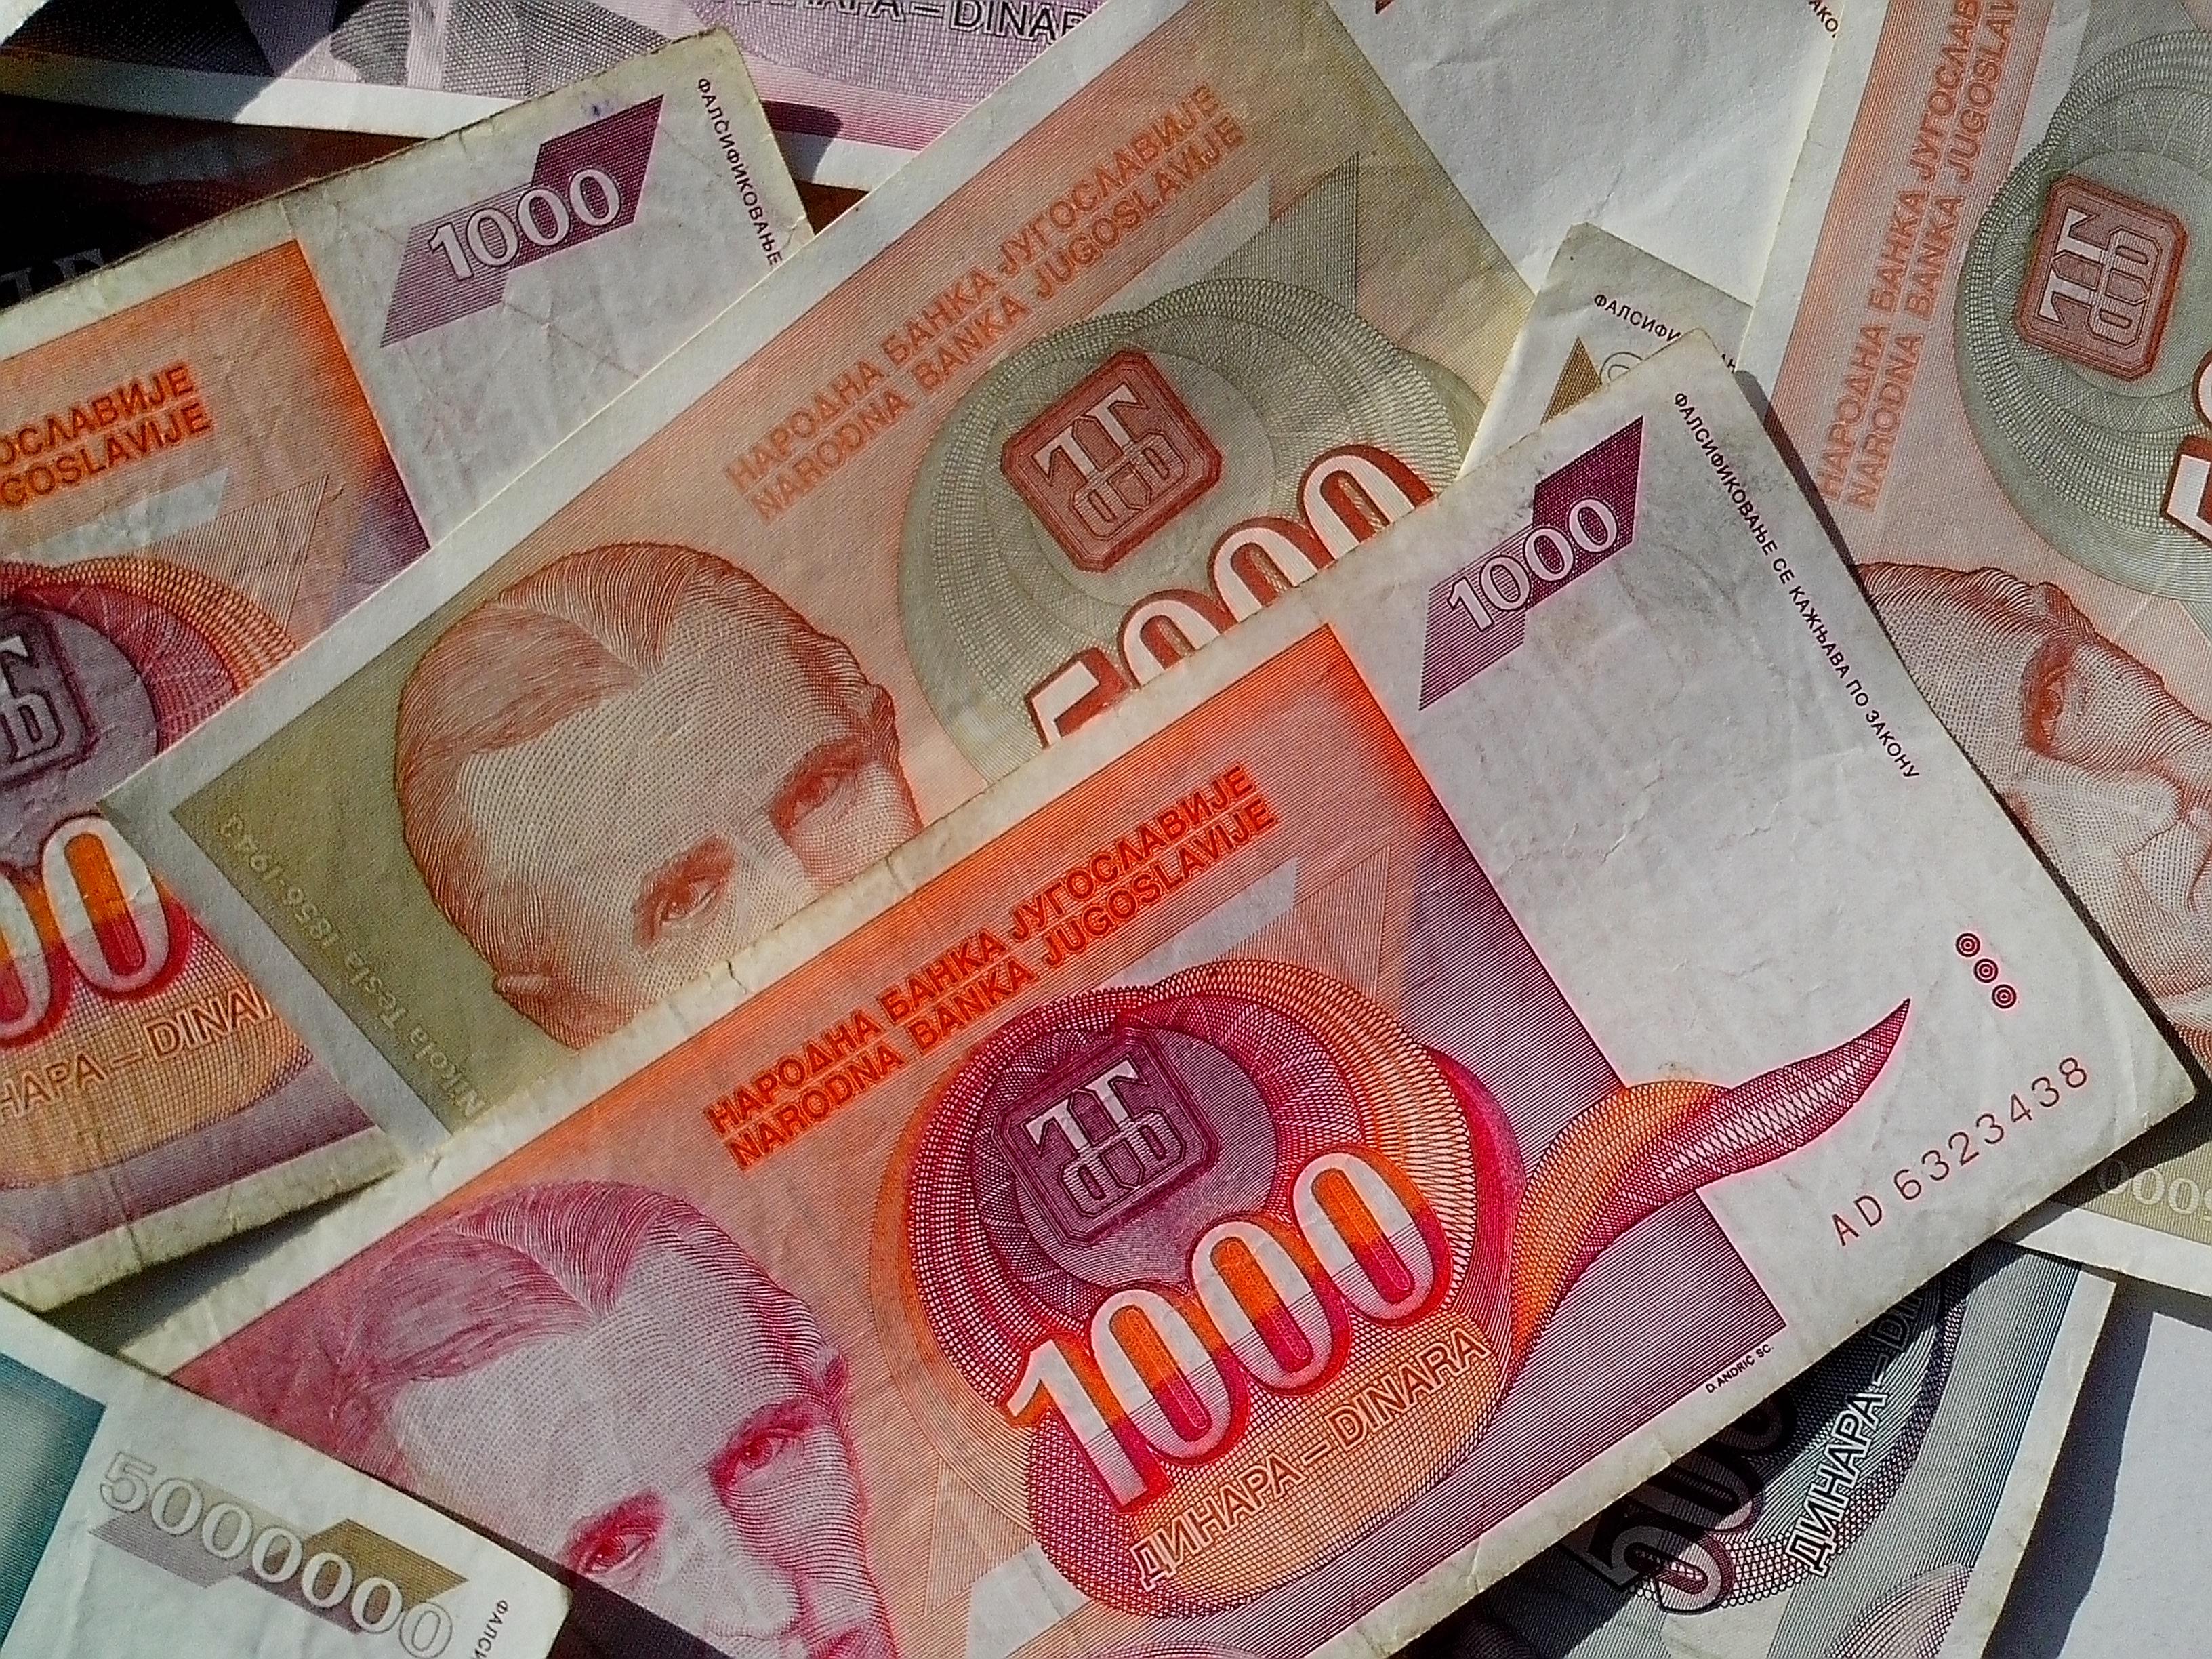 Free photograph; money, banknotes, Nikola, Tesla, cash